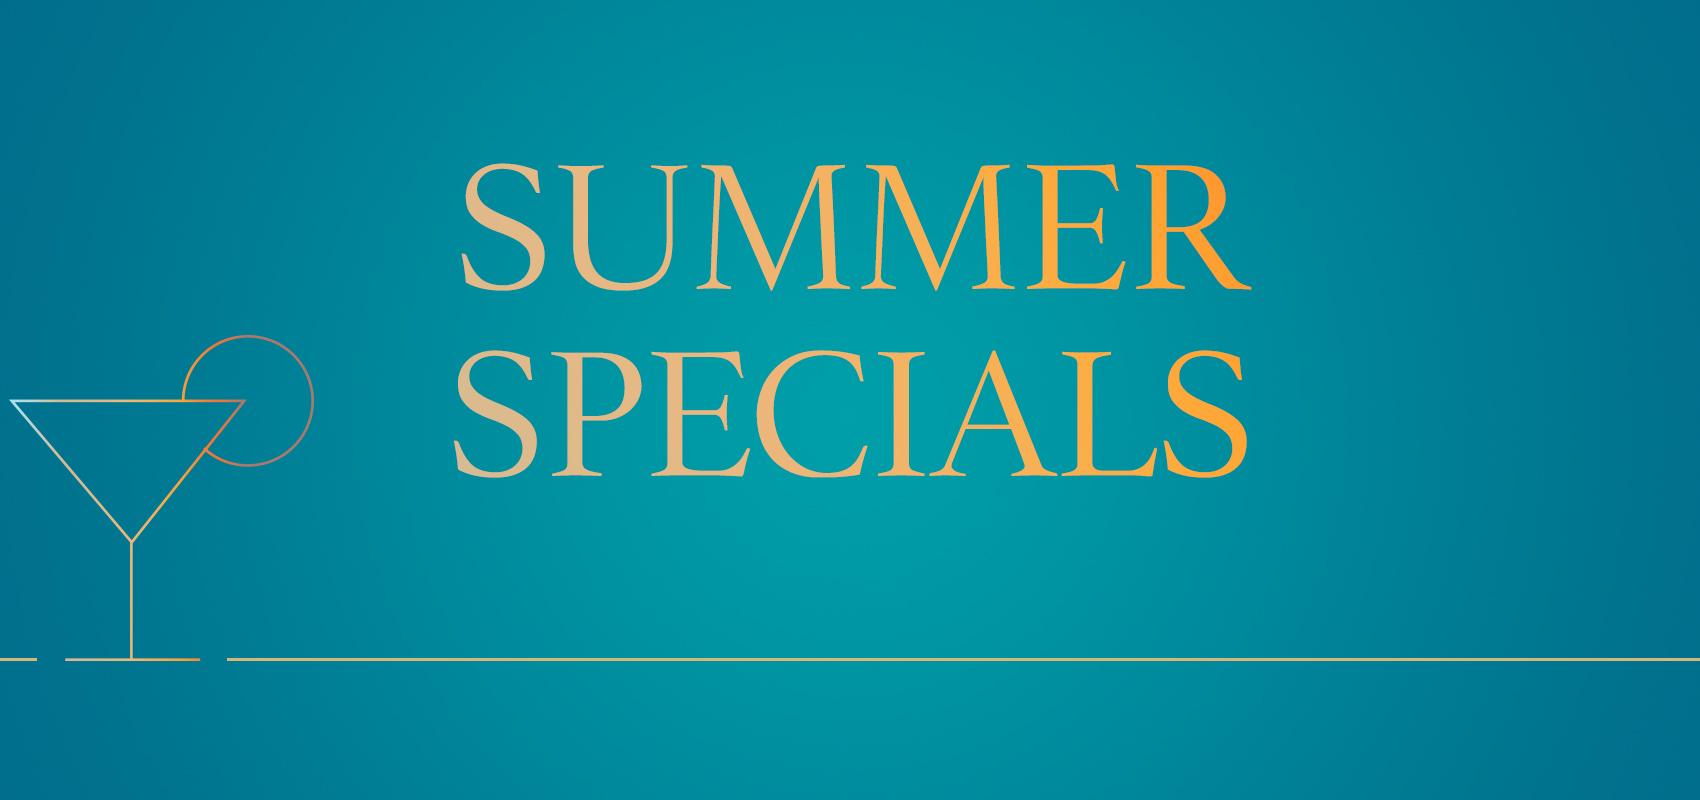 Charles Tyrwhitt Summer Specials